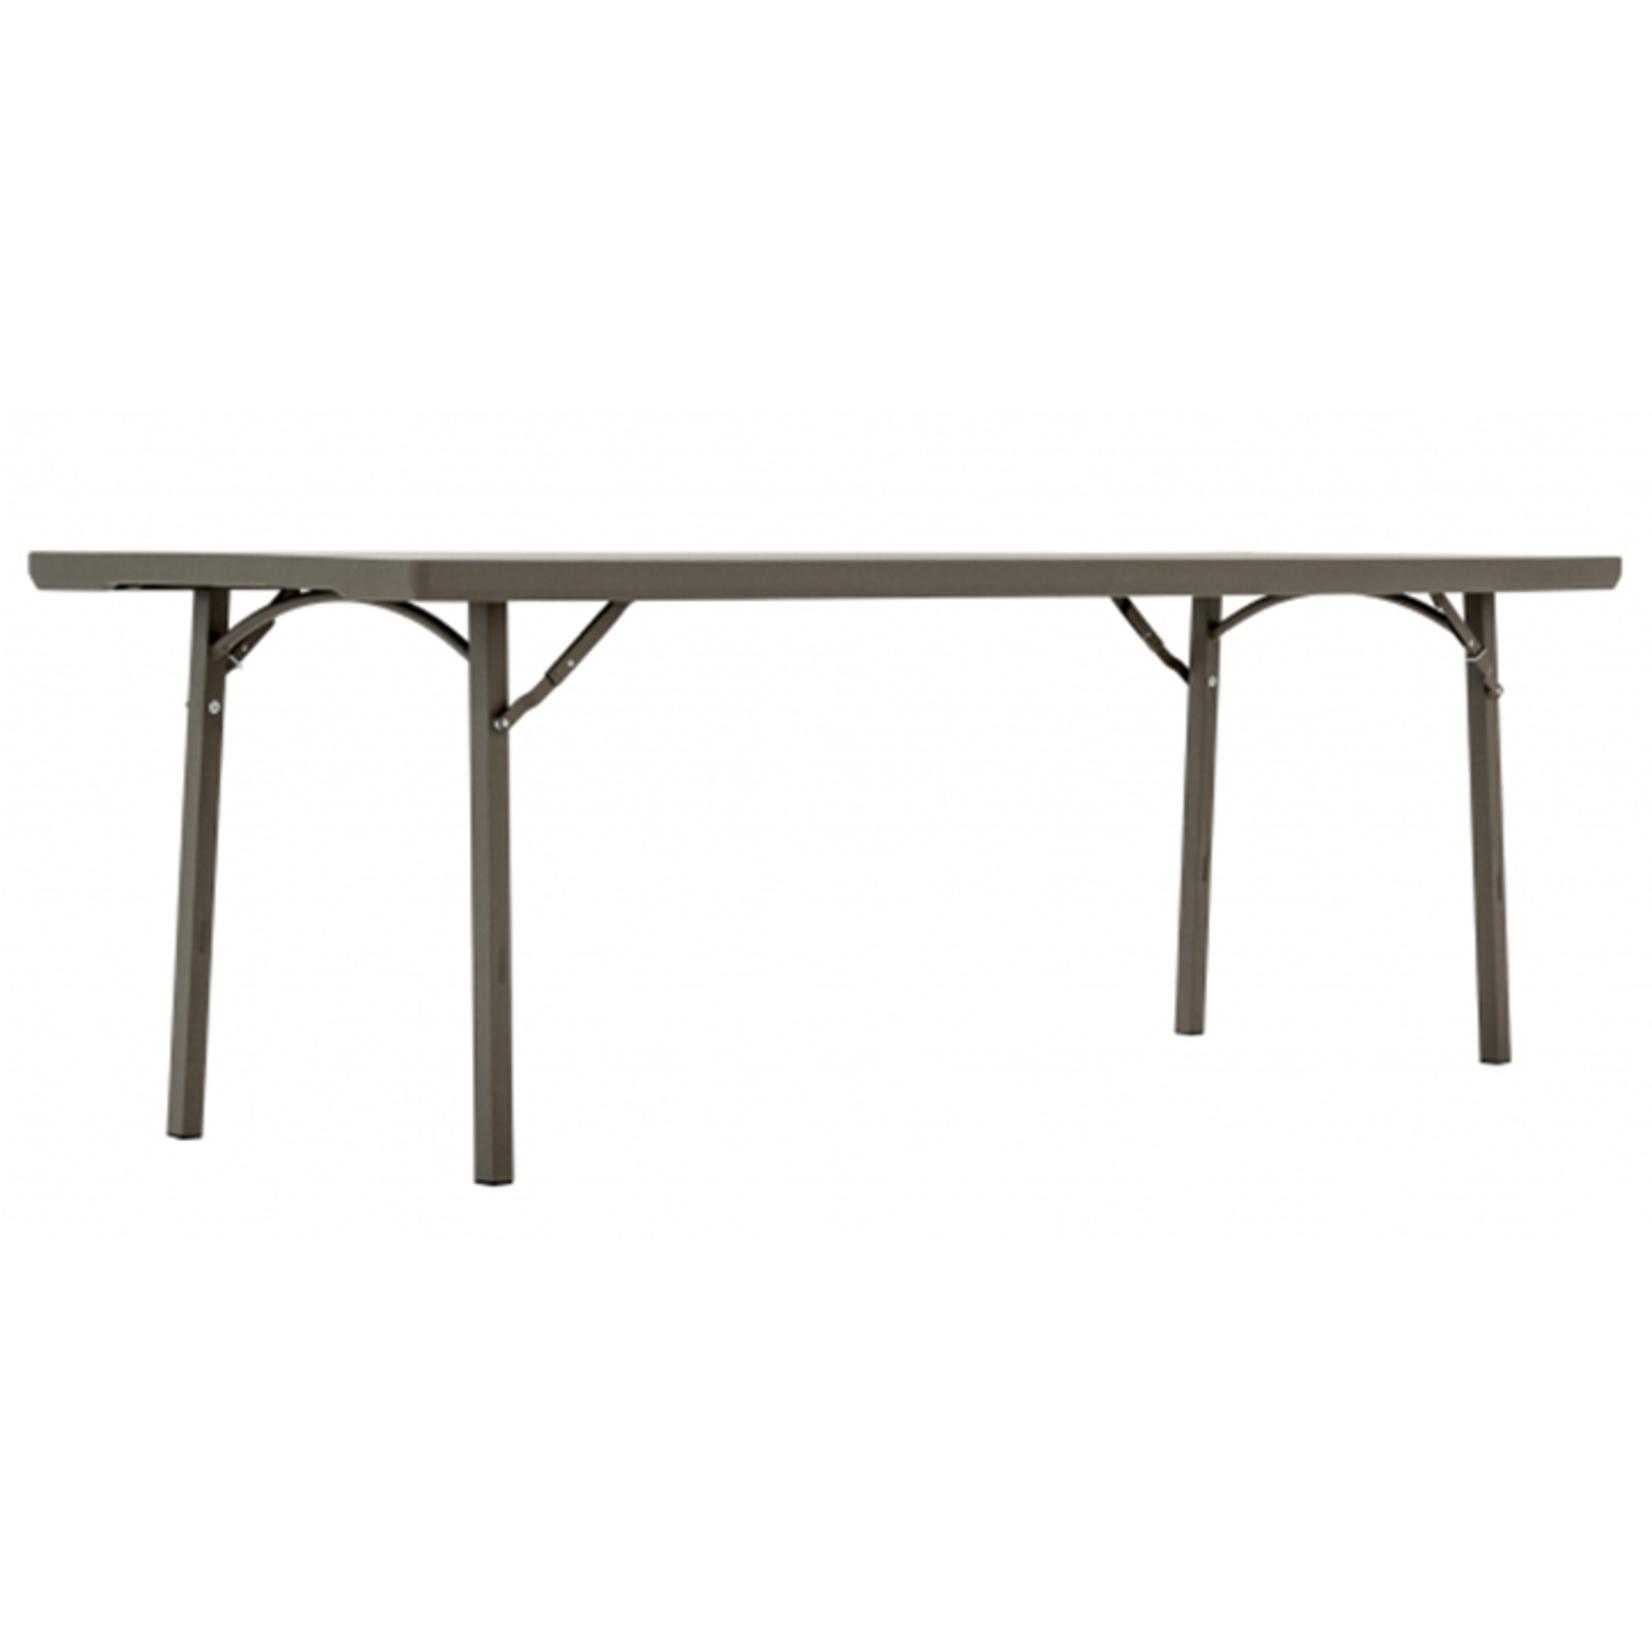 ZOWN XL8 TABLE